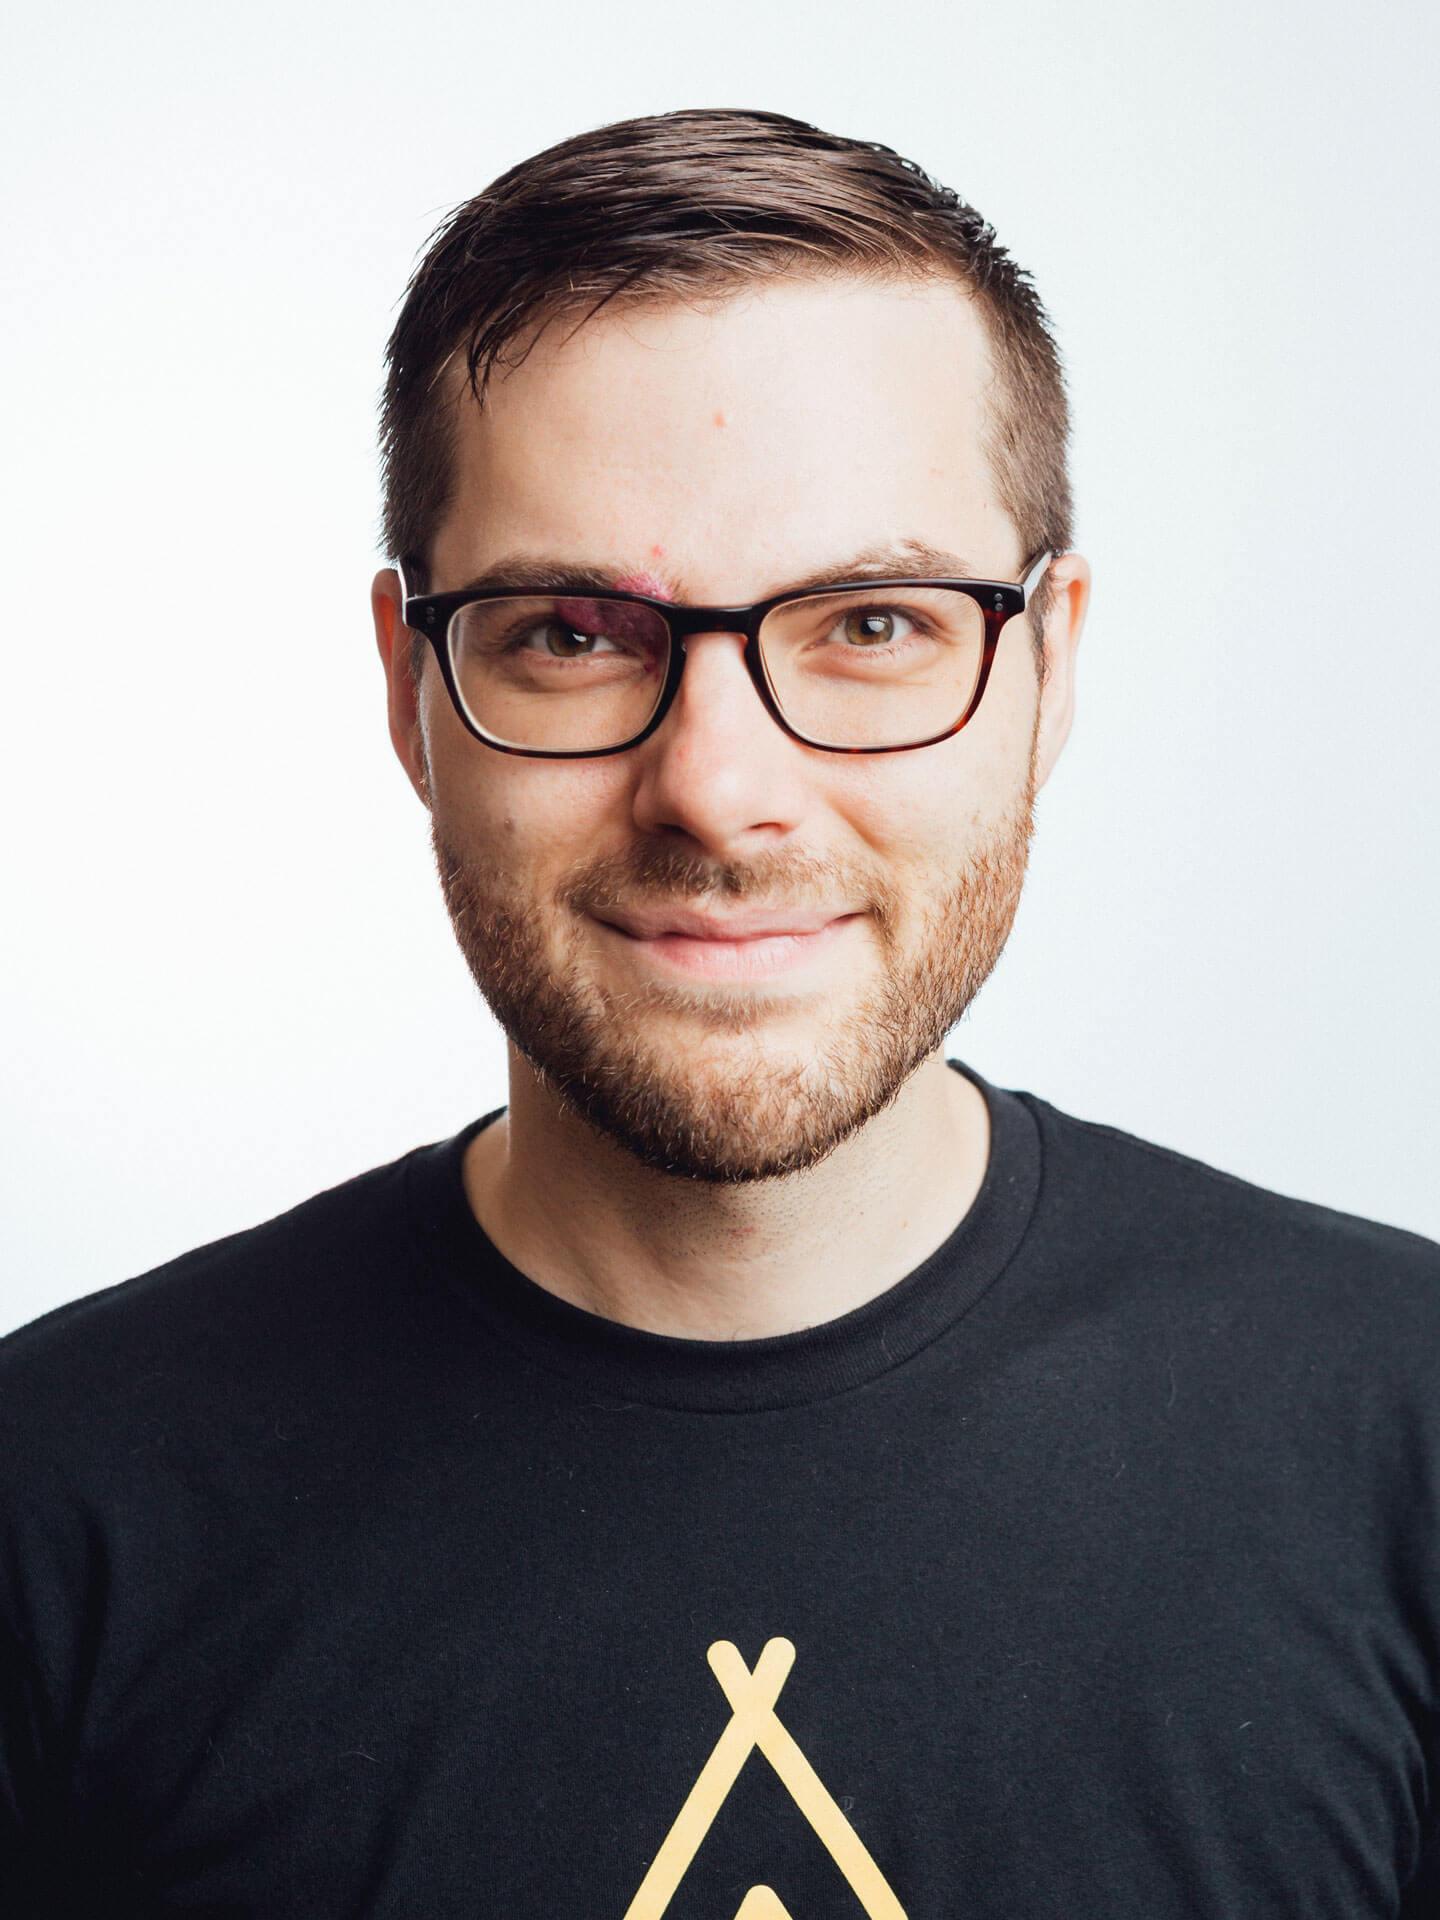 Mugshot-with-glasses copy.jpg